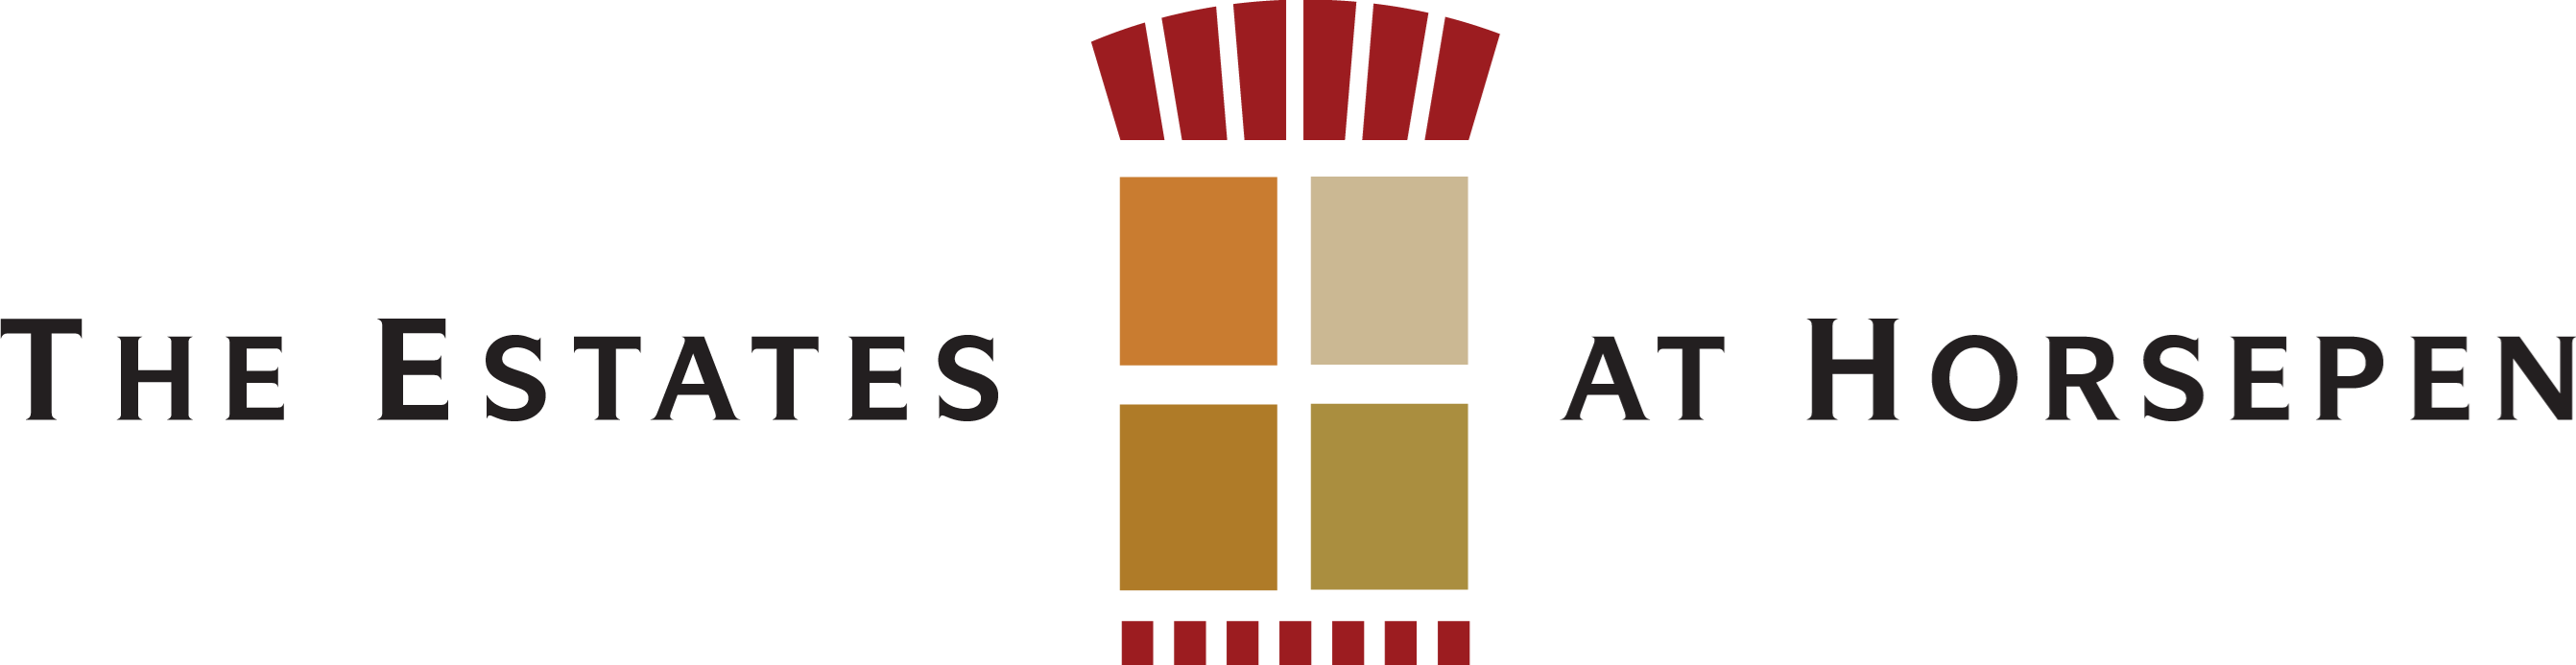 The Estates at Horsepen Property Logo 2